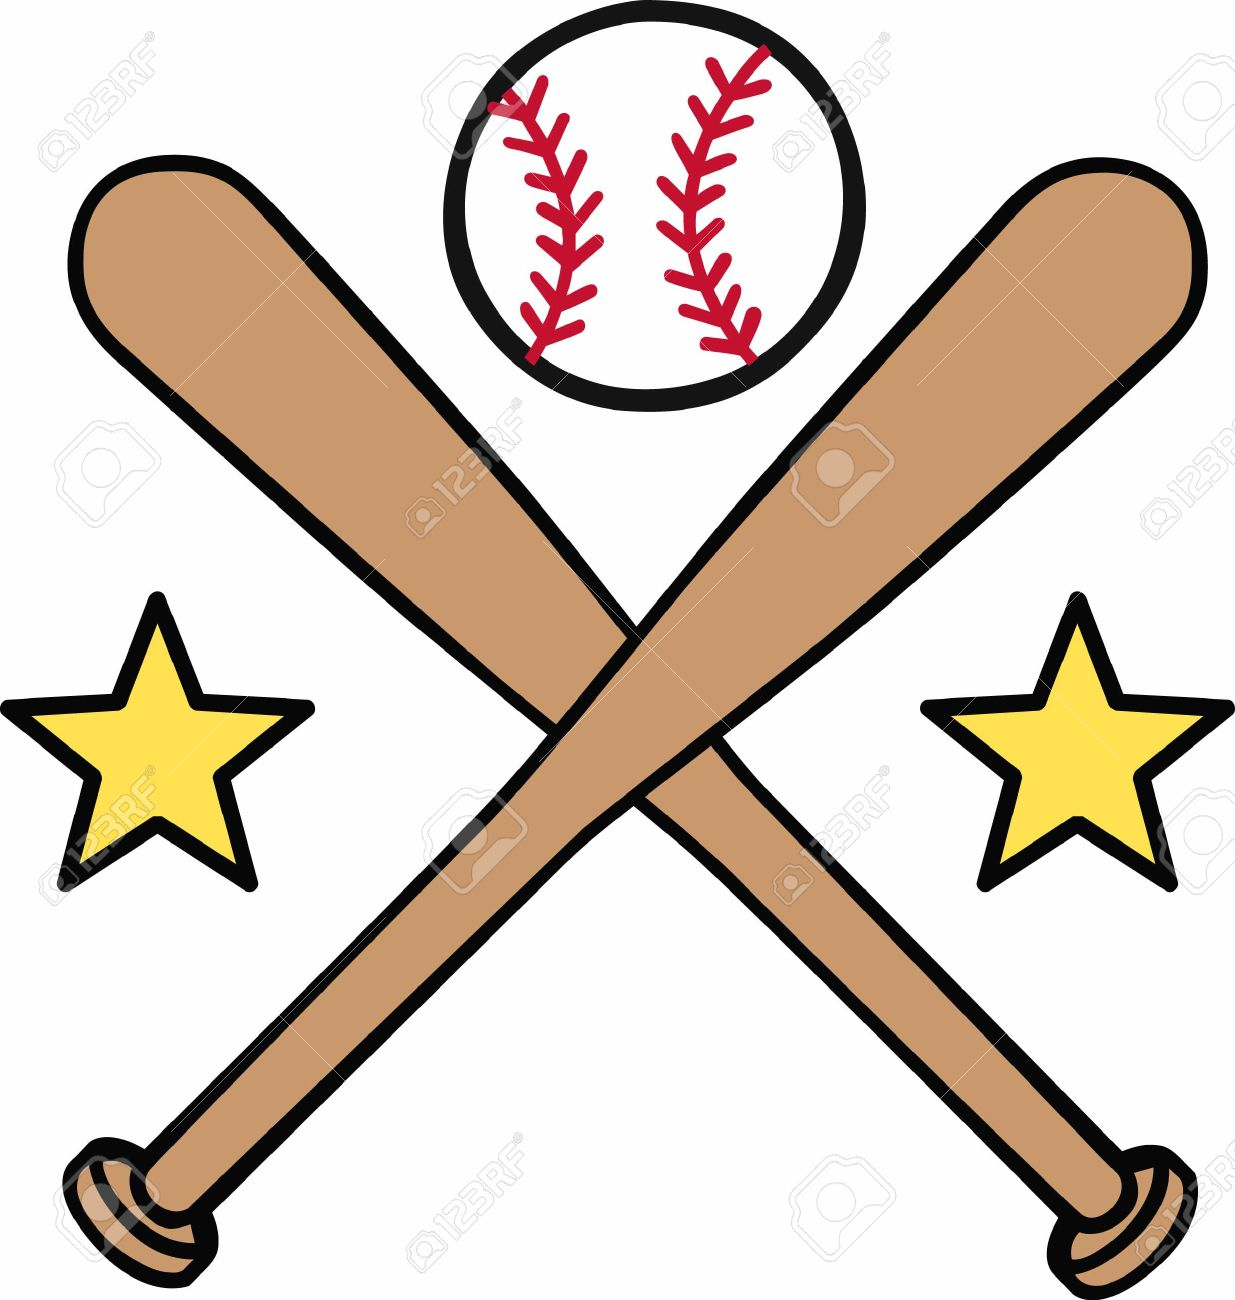 Baseball chain banner clipart free svg freeuse download Baseball Bat Crossed   Free download best Baseball Bat Crossed on ... svg freeuse download